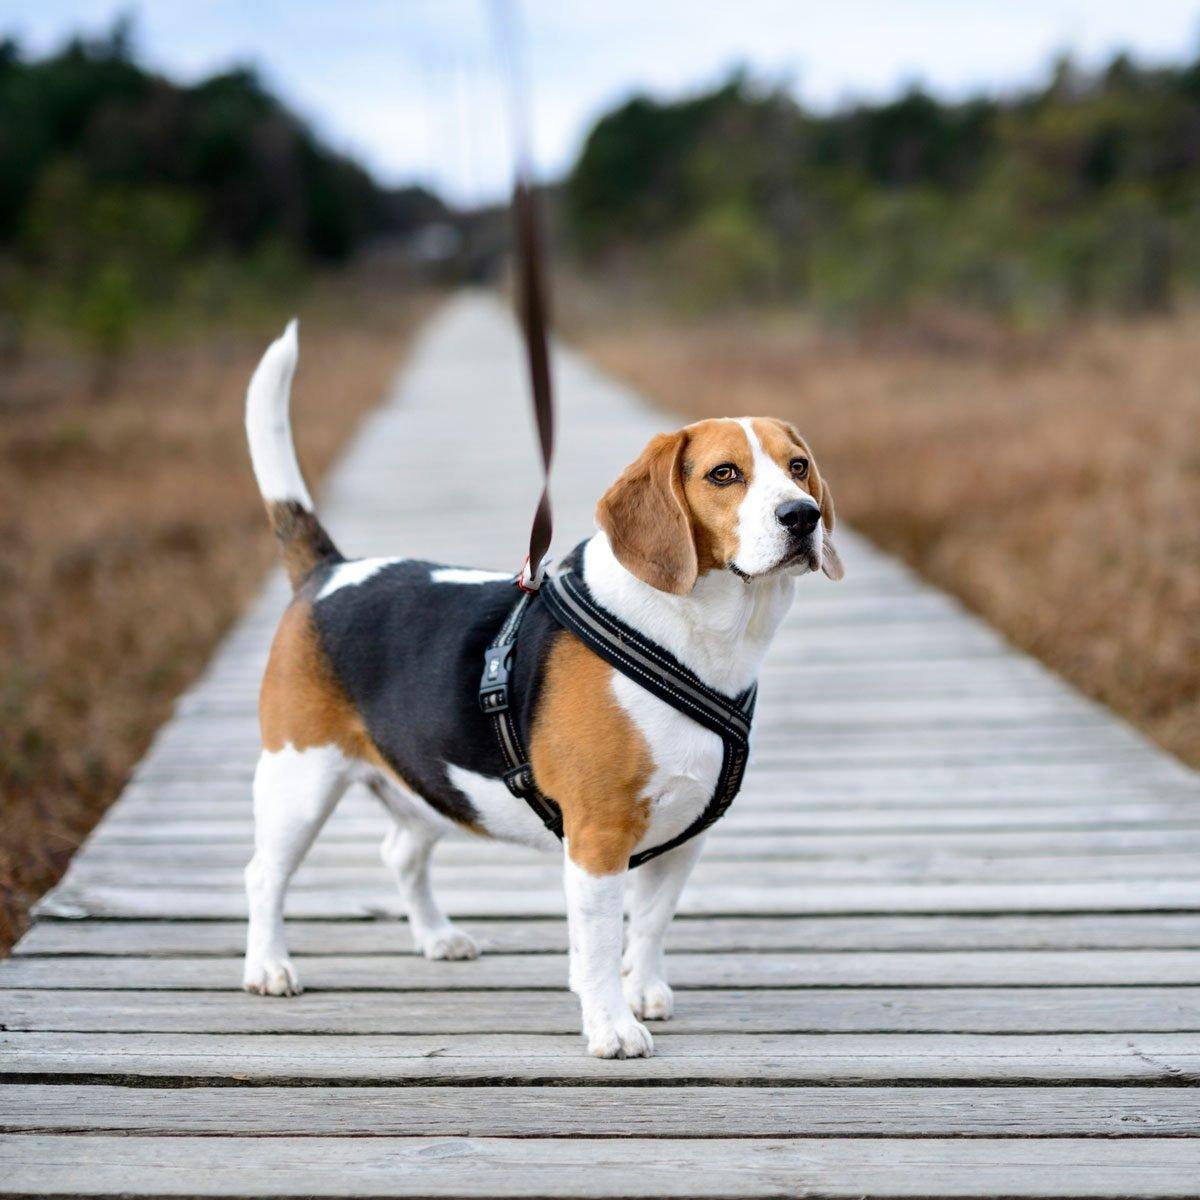 Beagle wearing a dog harness